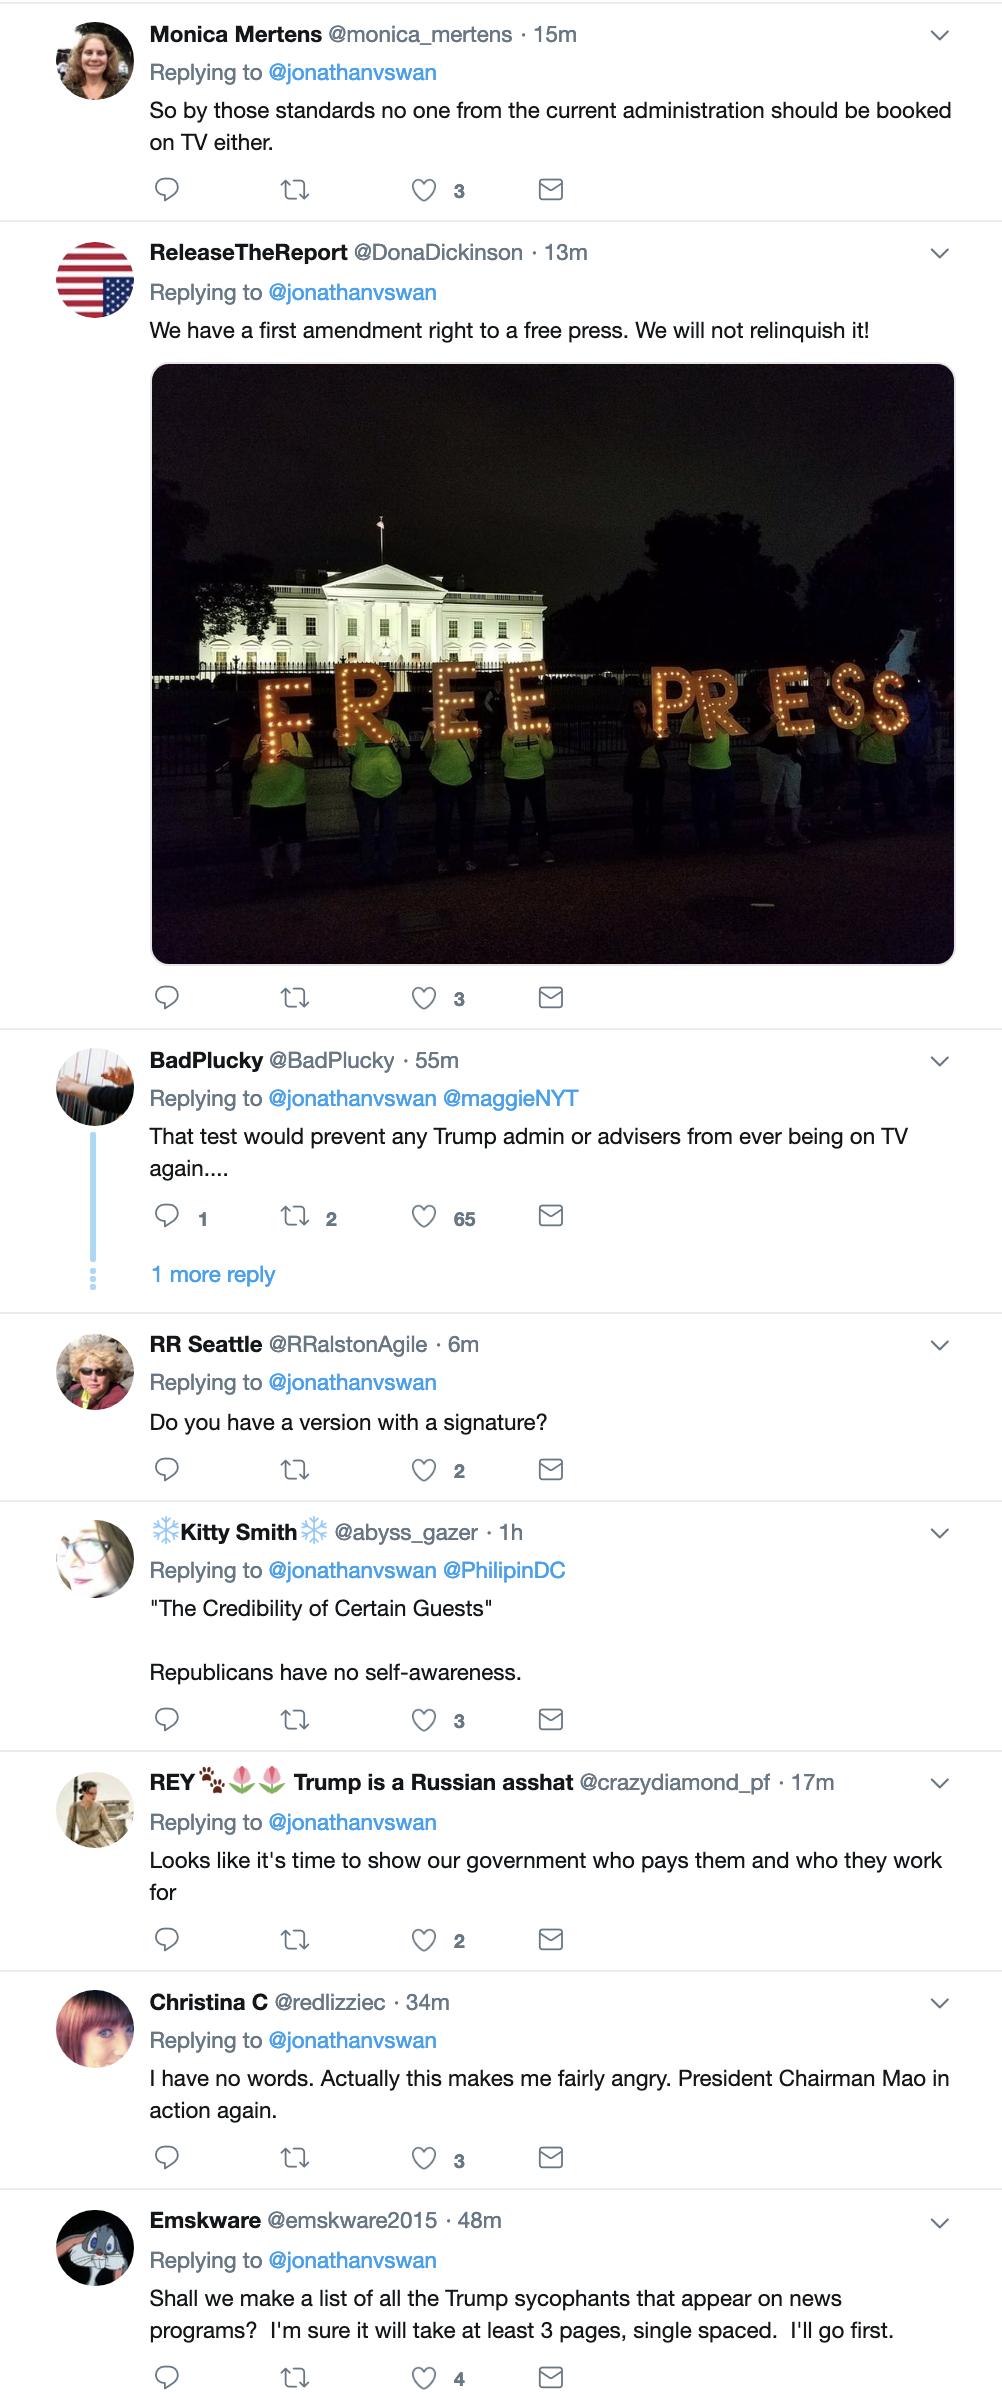 Screen-Shot-2019-03-25-at-3.29.45-PM Trump Sends Chilling Memo To Mainstream Media Outlets Corruption Crime Donald Trump Media Politics Social Media Top Stories